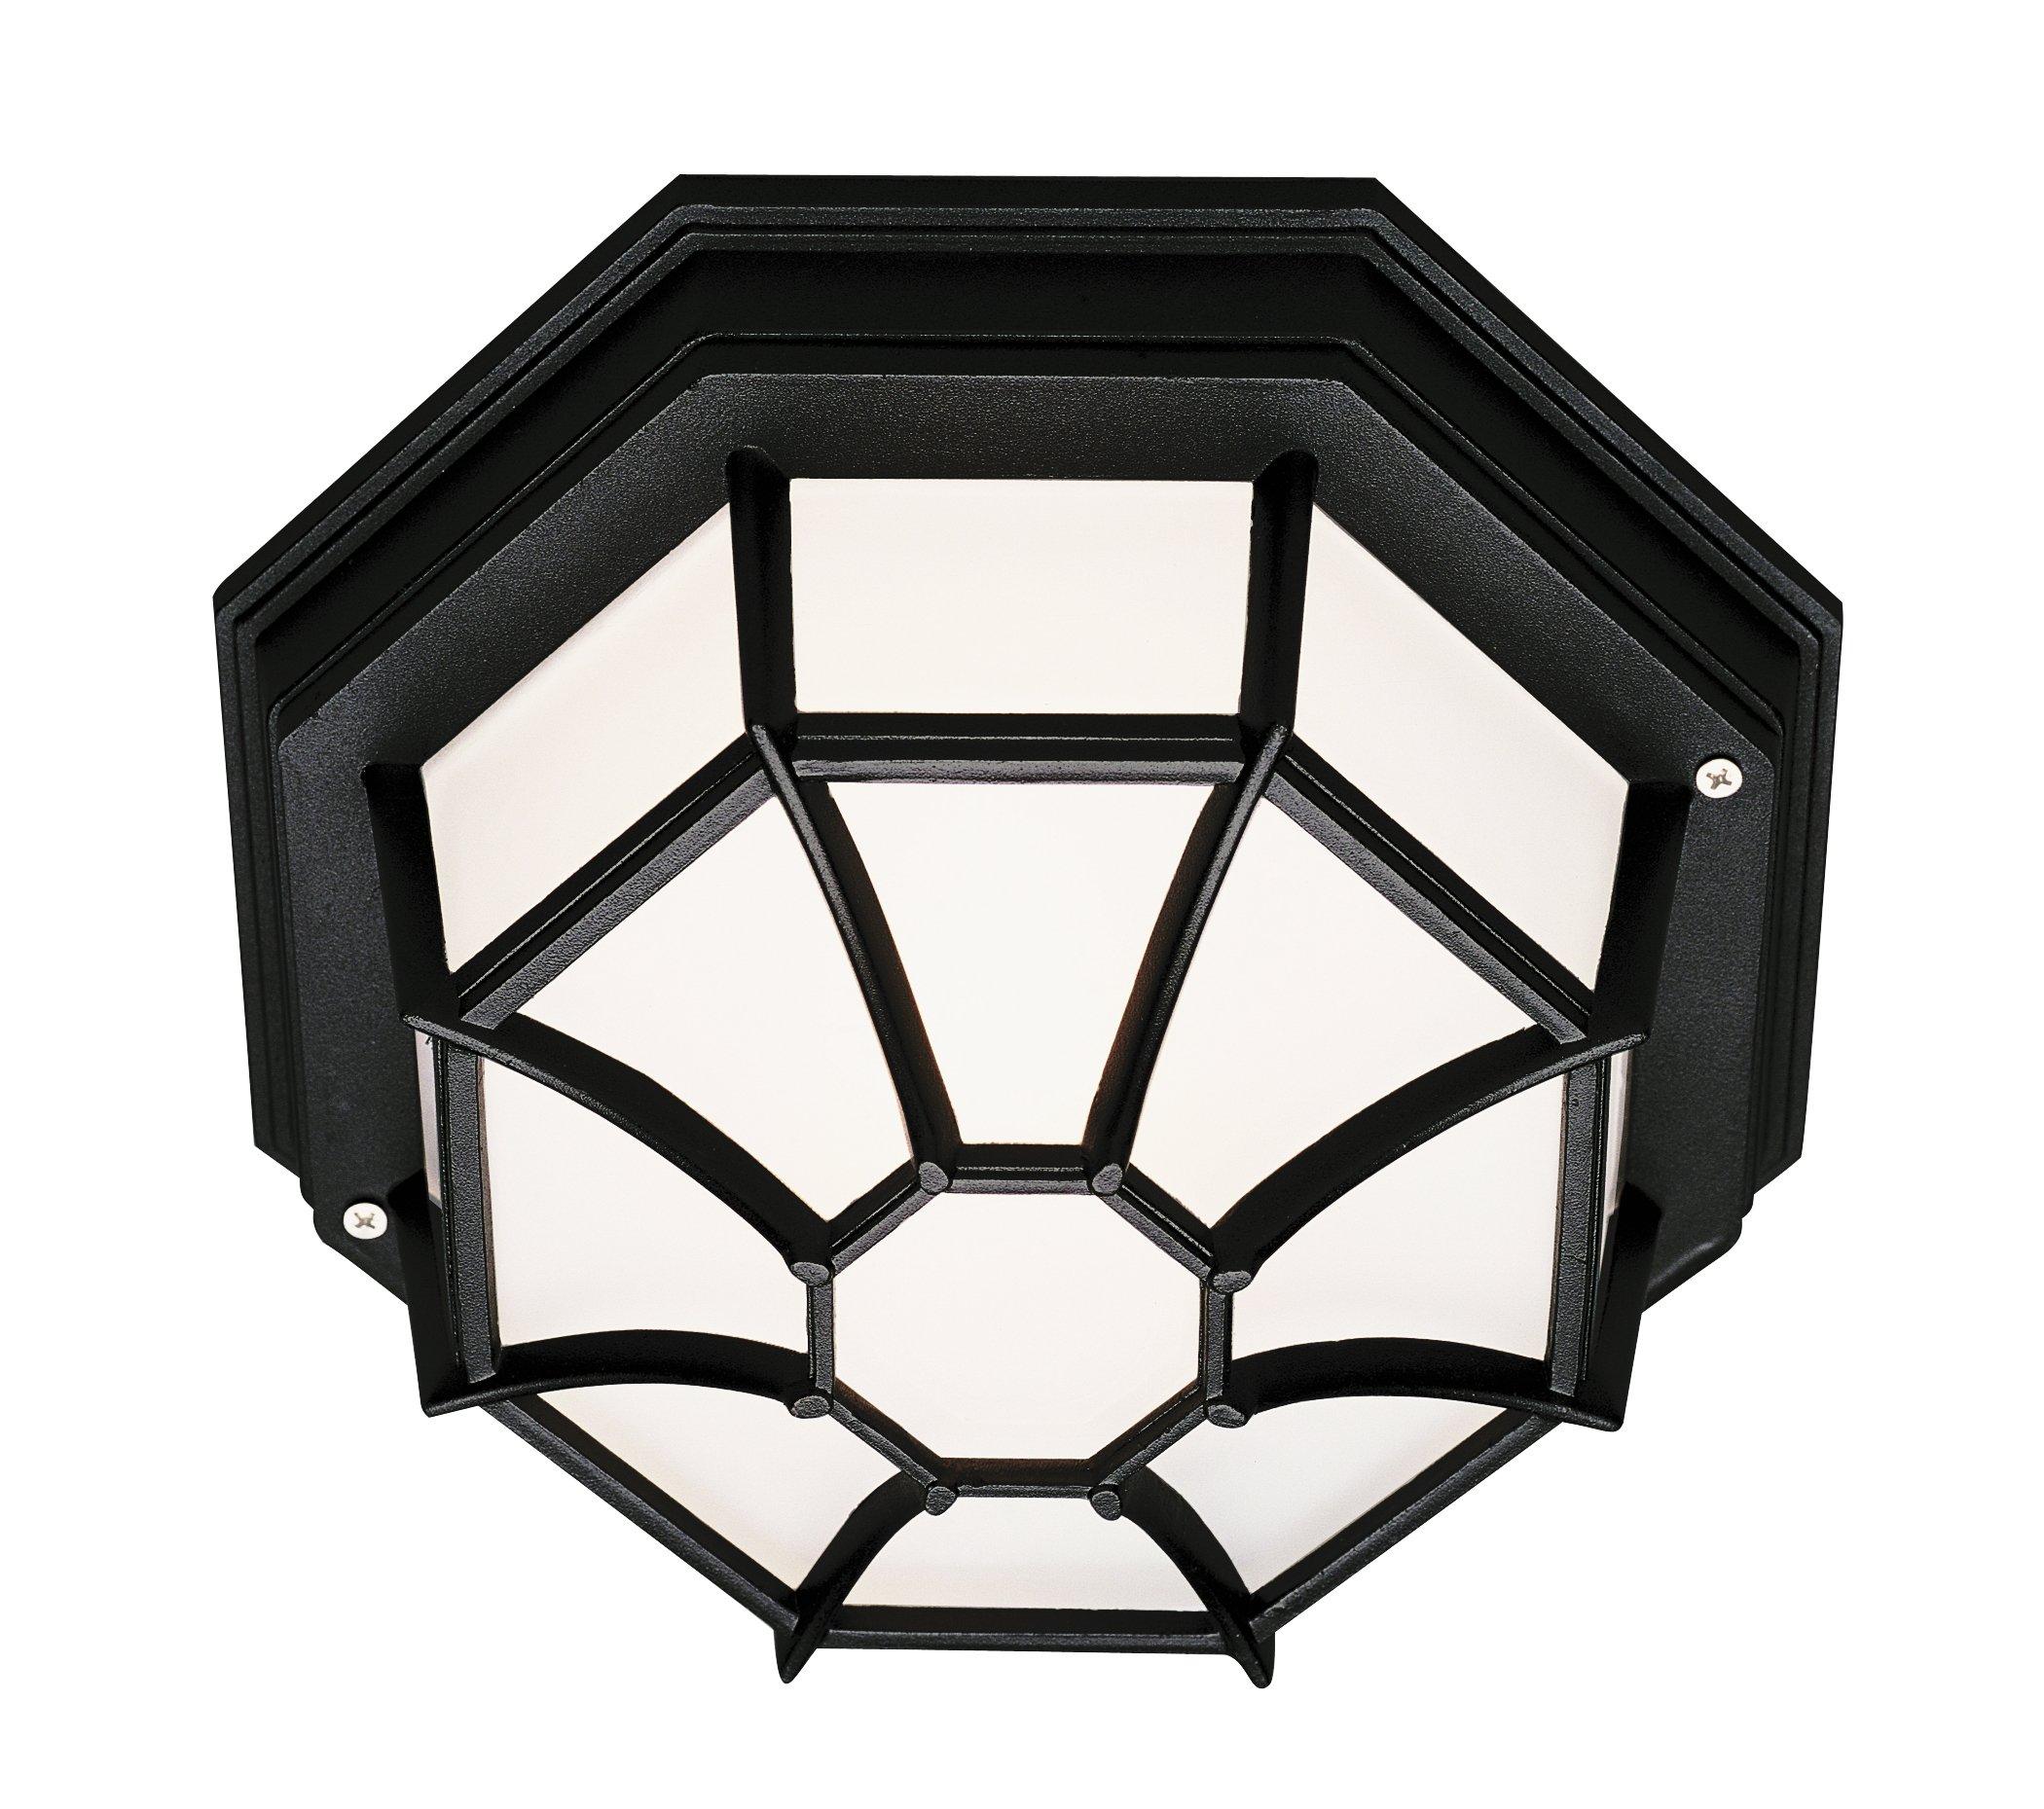 Trans Globe Lighting PL-40582 BK Outdoor Benkert 5'' Flushmount Lantern, Black